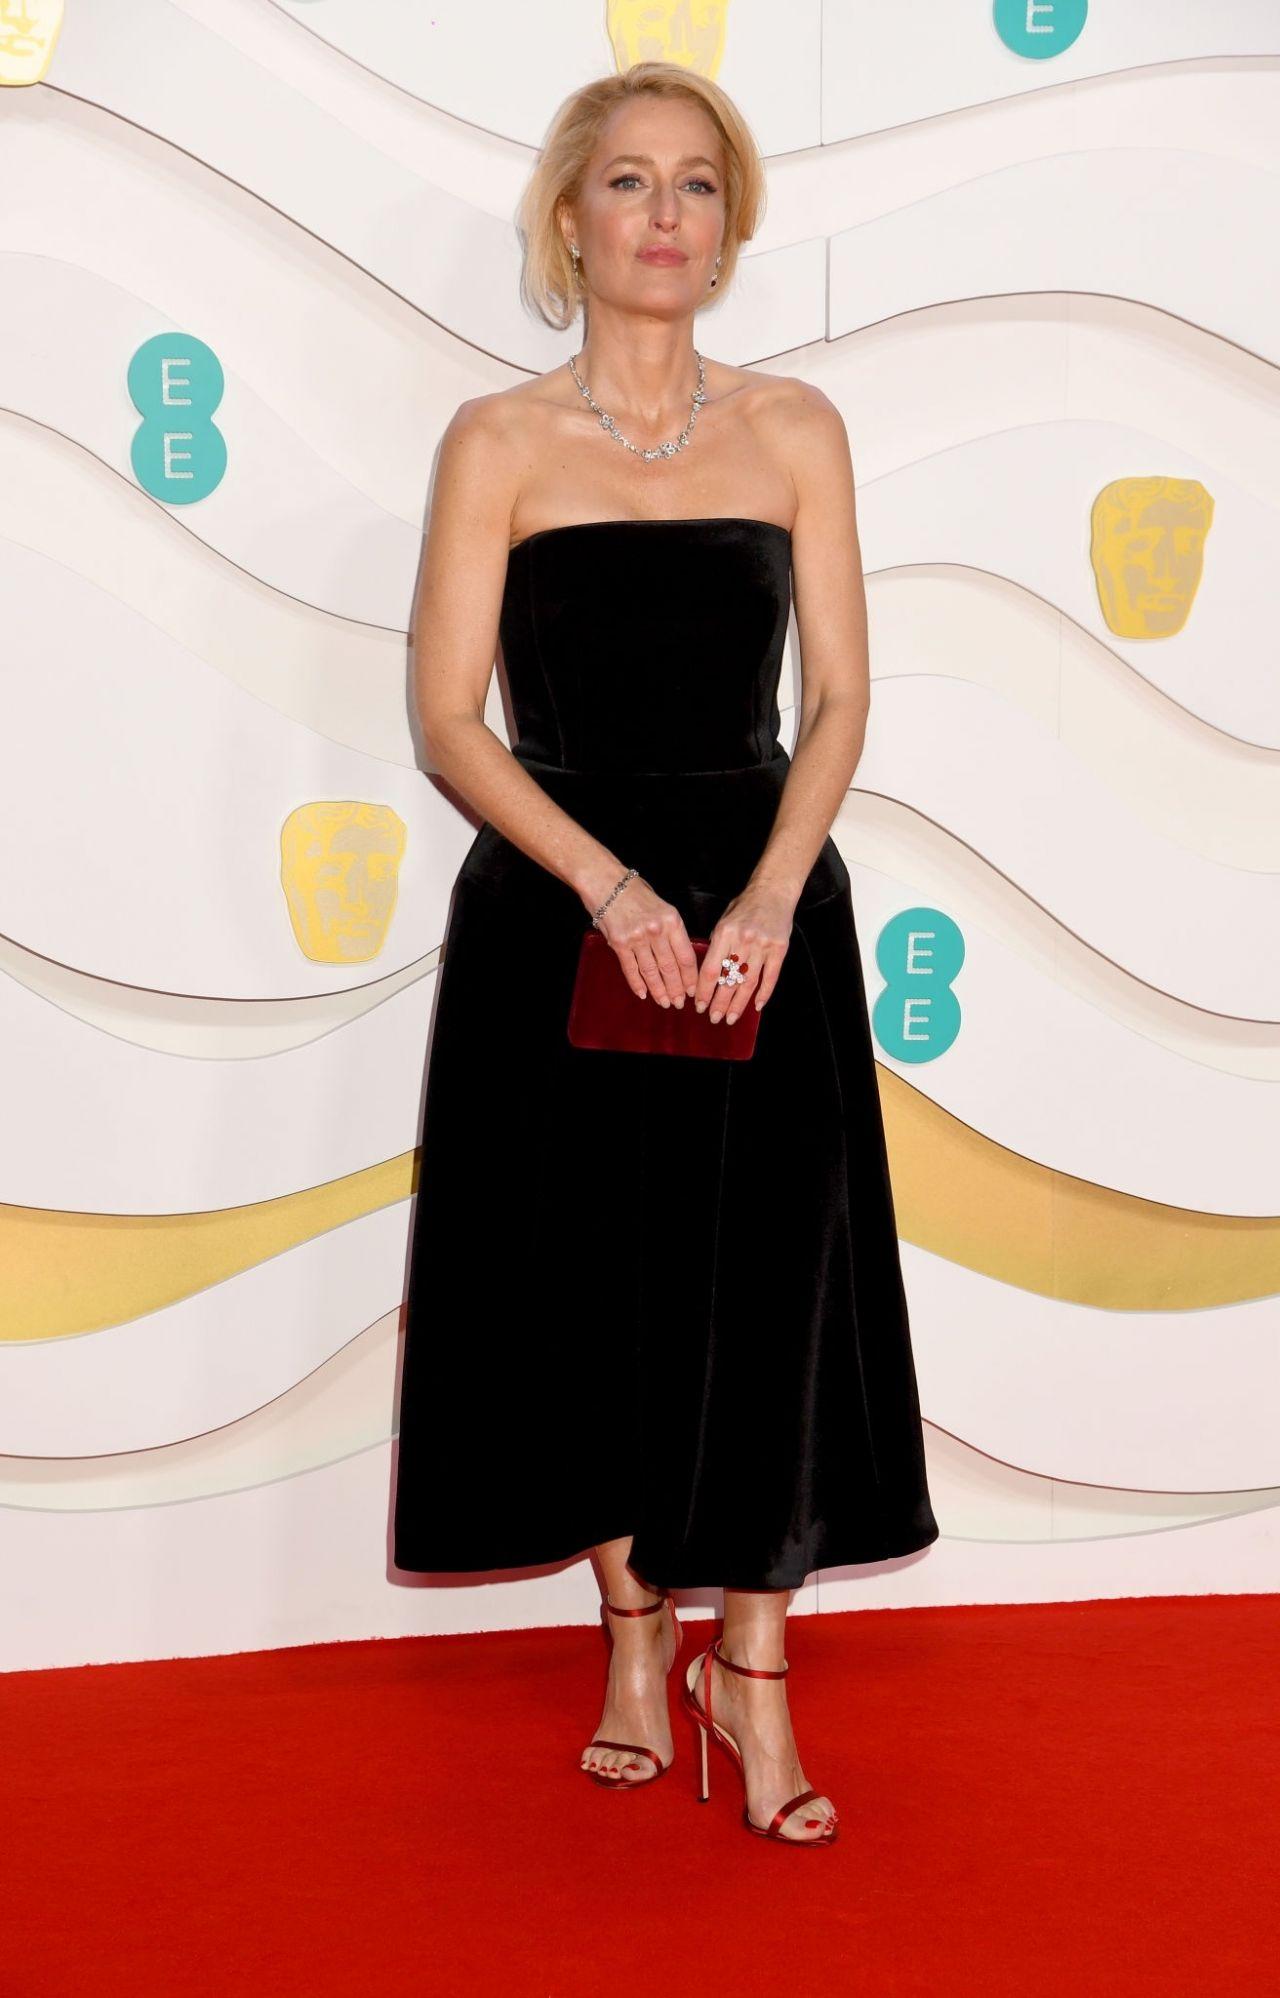 gillian-anderson-in-camilla-and-marc-2020-ee-british-academy-film-awards